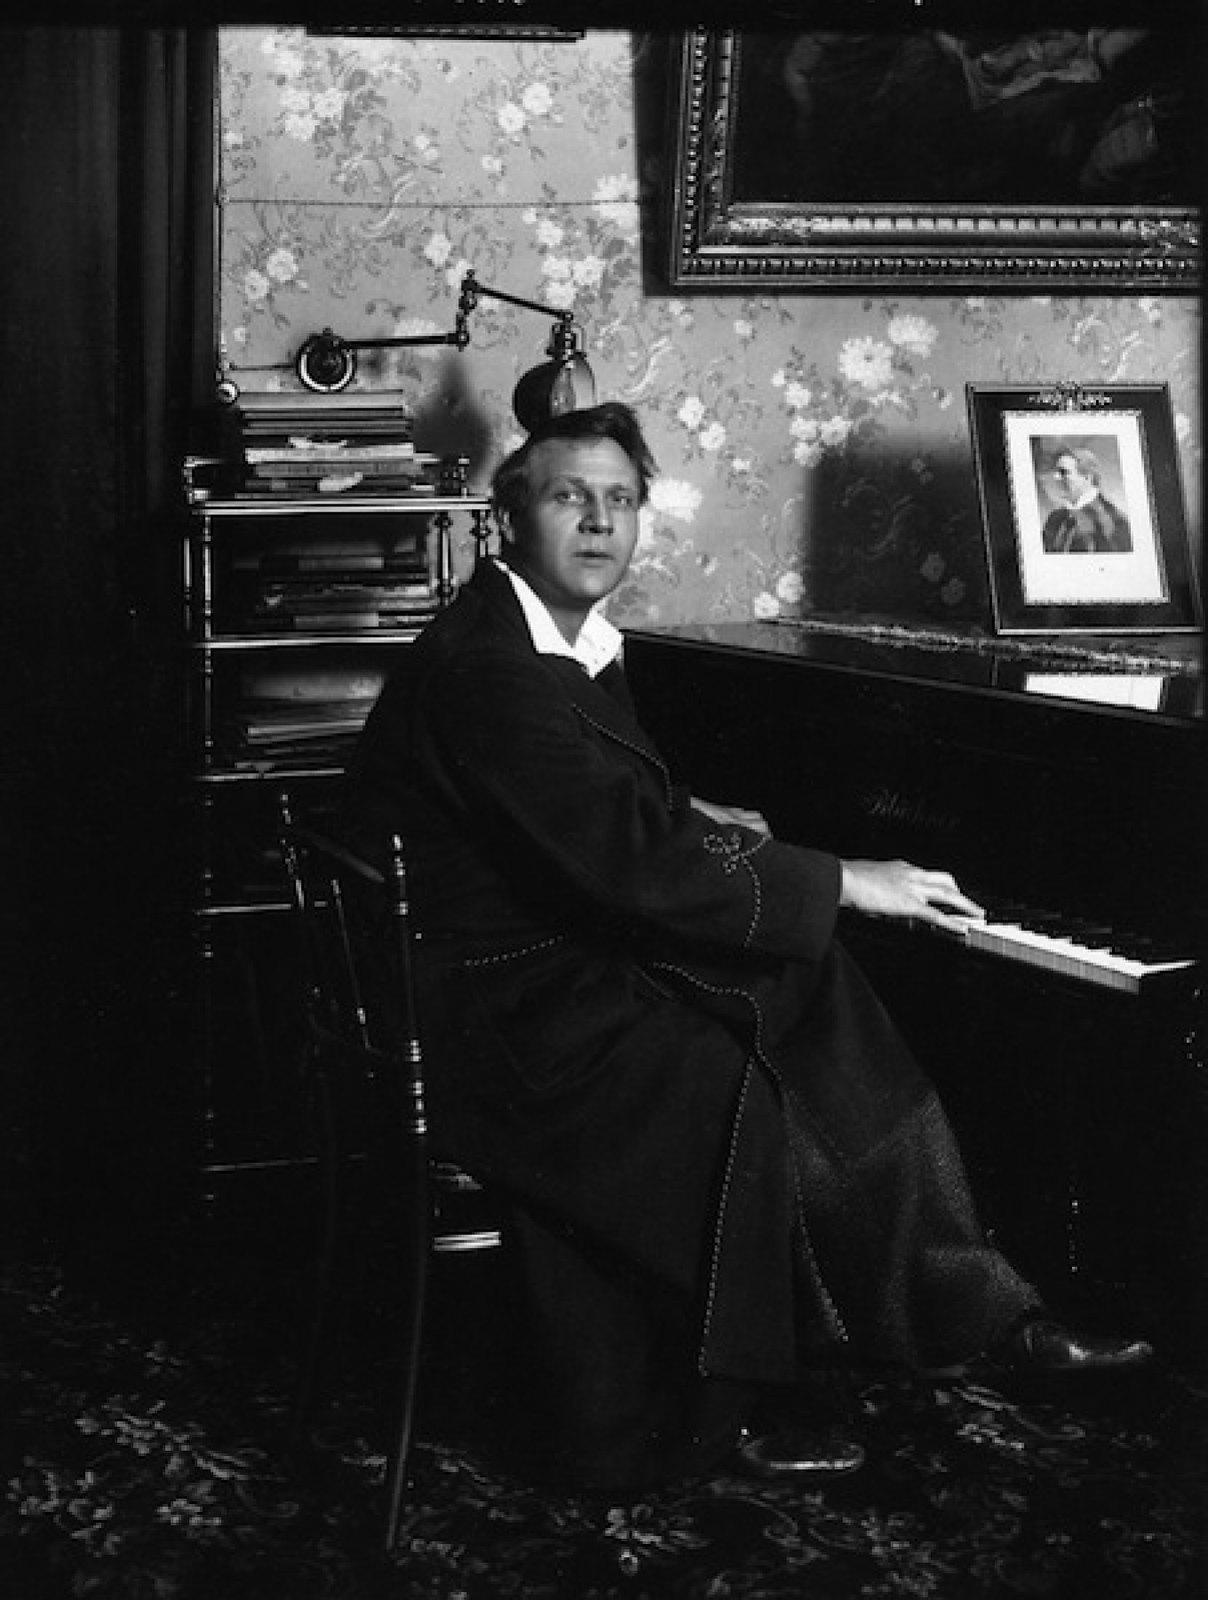 1913. Портрет Федора Шаляпина